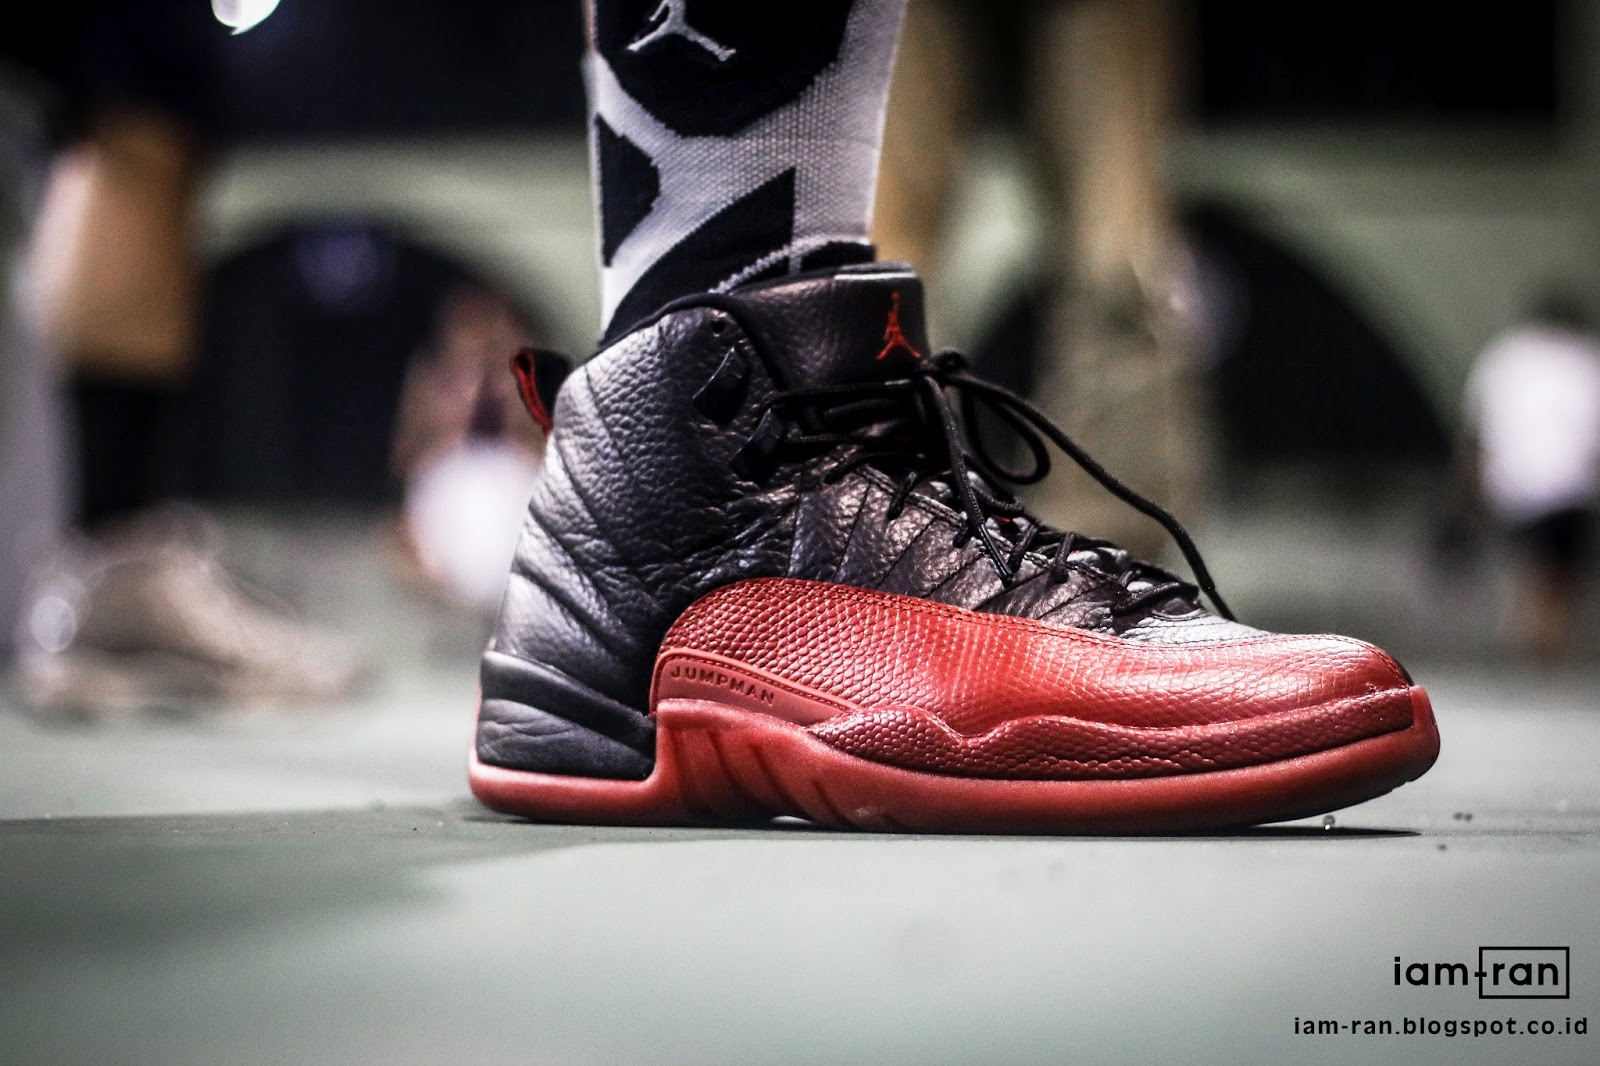 low priced c19c0 3f2de ON FEET   Vitra - Nike Air Jordan 12